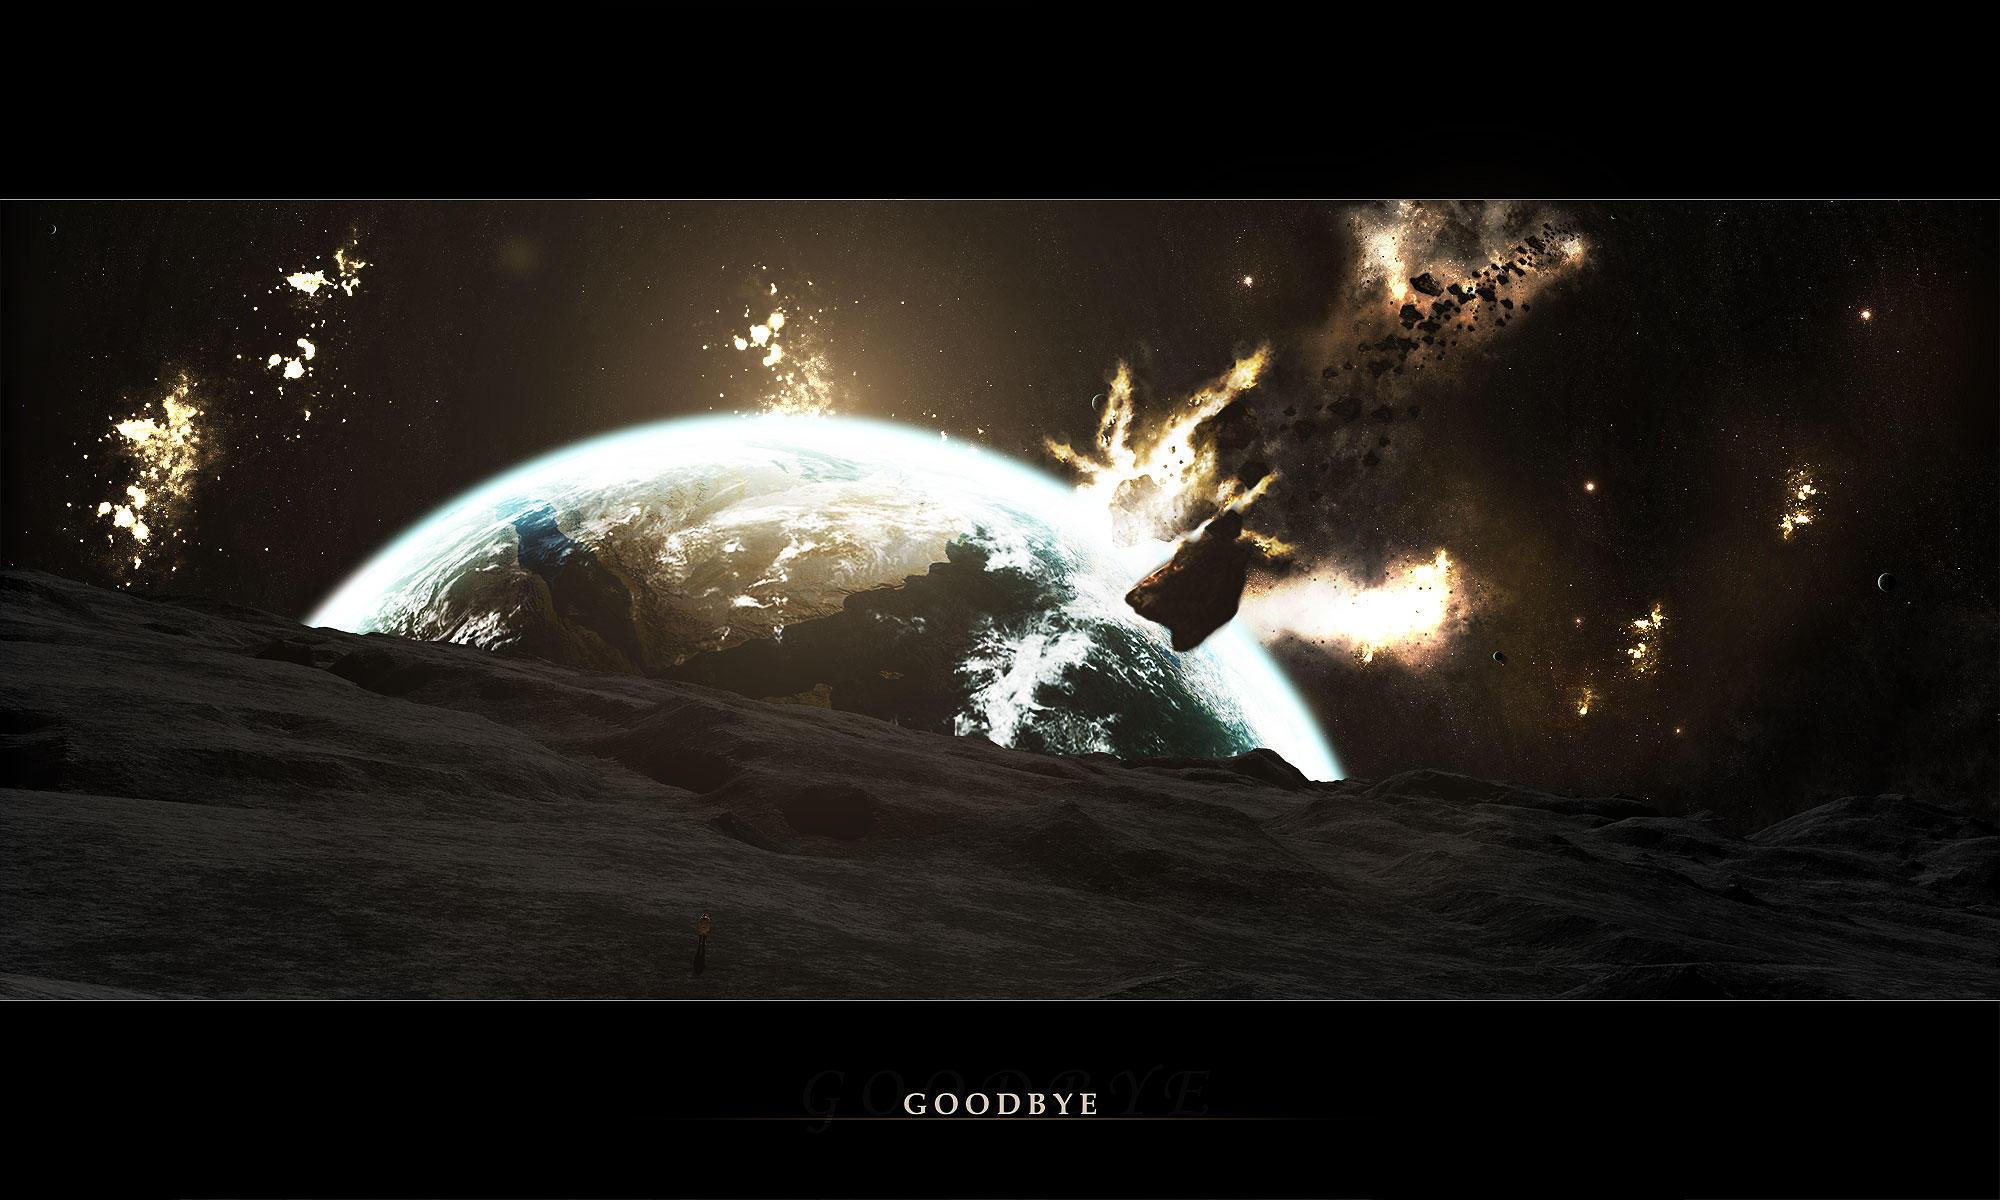 Goodbye - Remix 2 by alyn